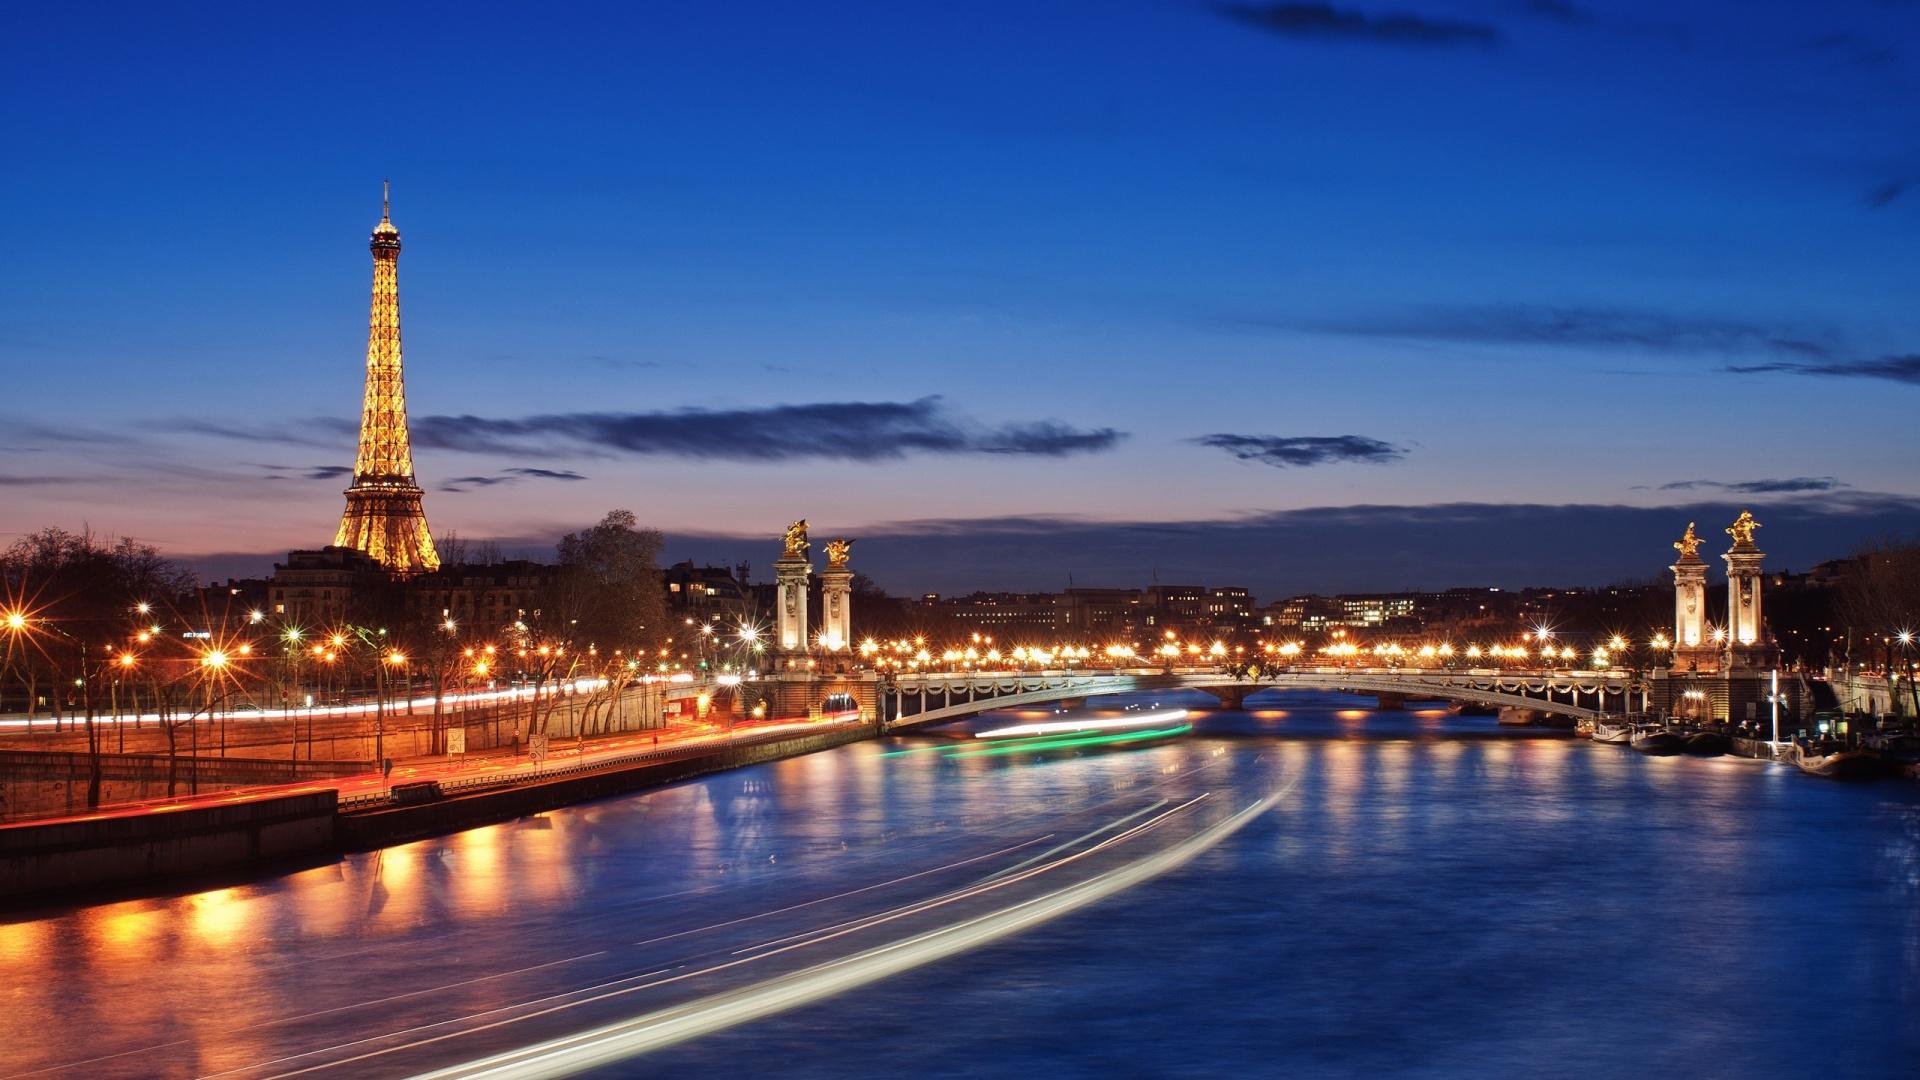 kinh nghiem du lịch paris 4 elle man